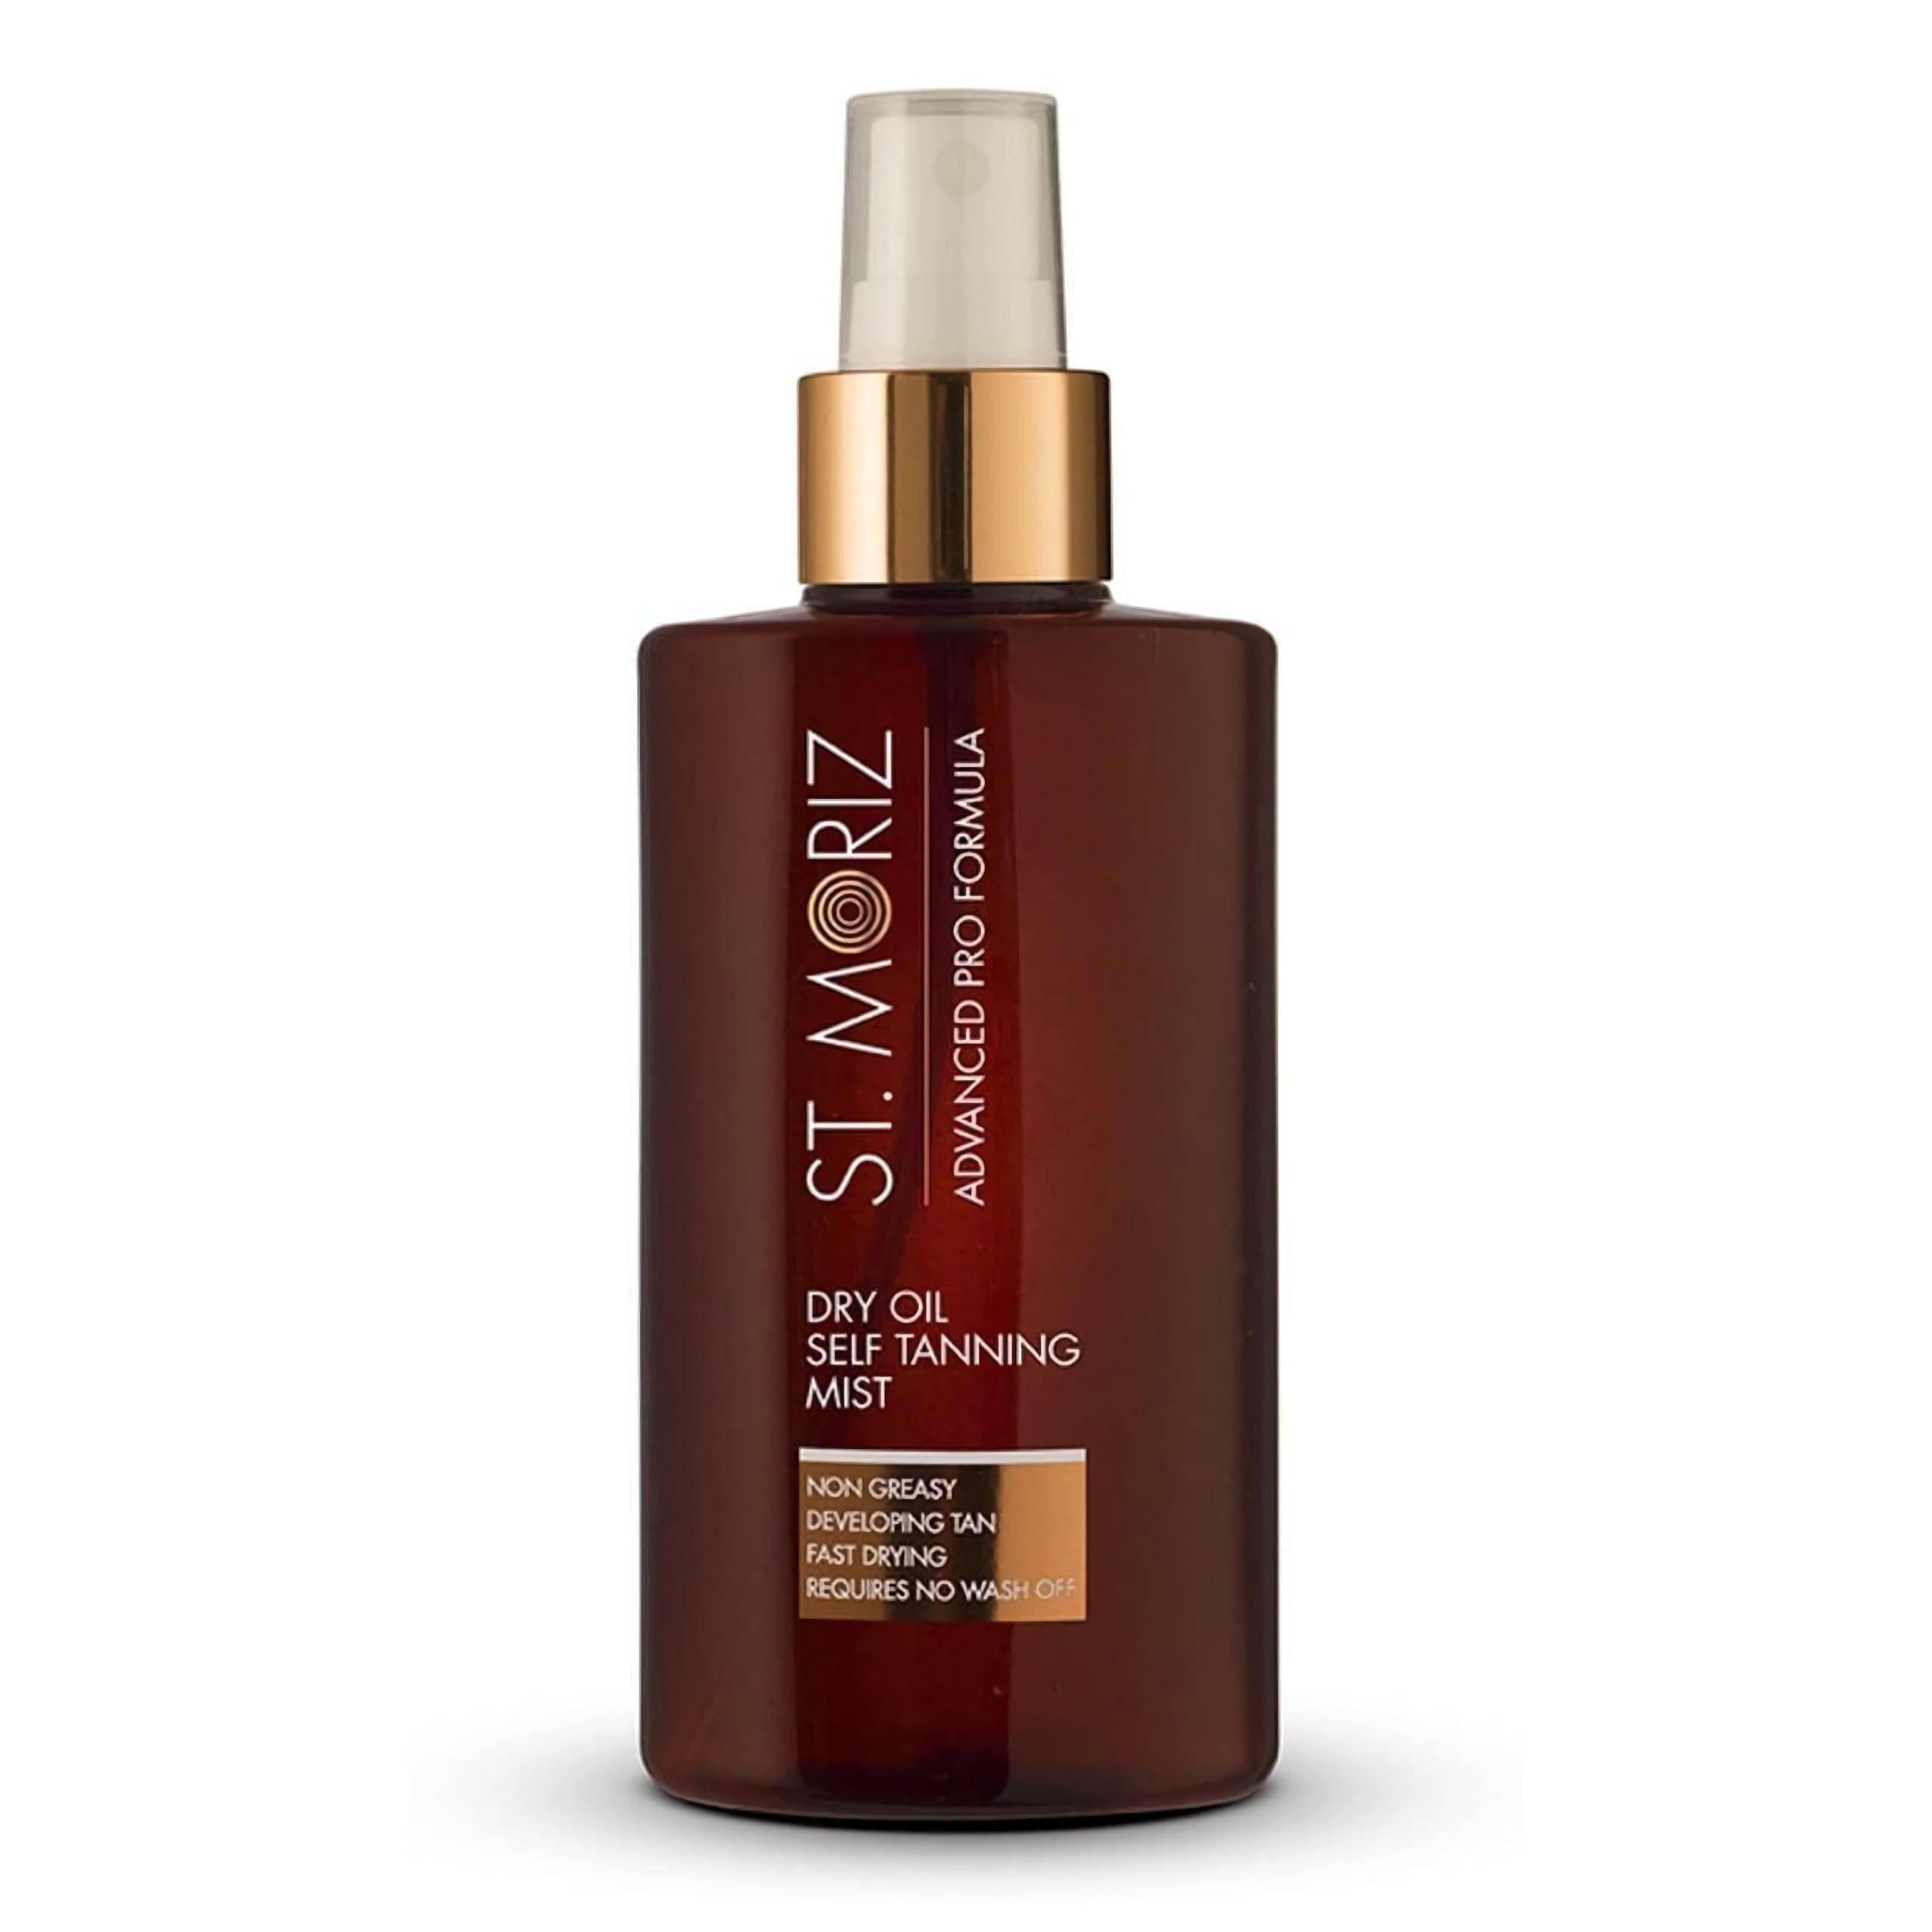 St.Moriz Advanced Pro Dry Oil Self Tanning Mist